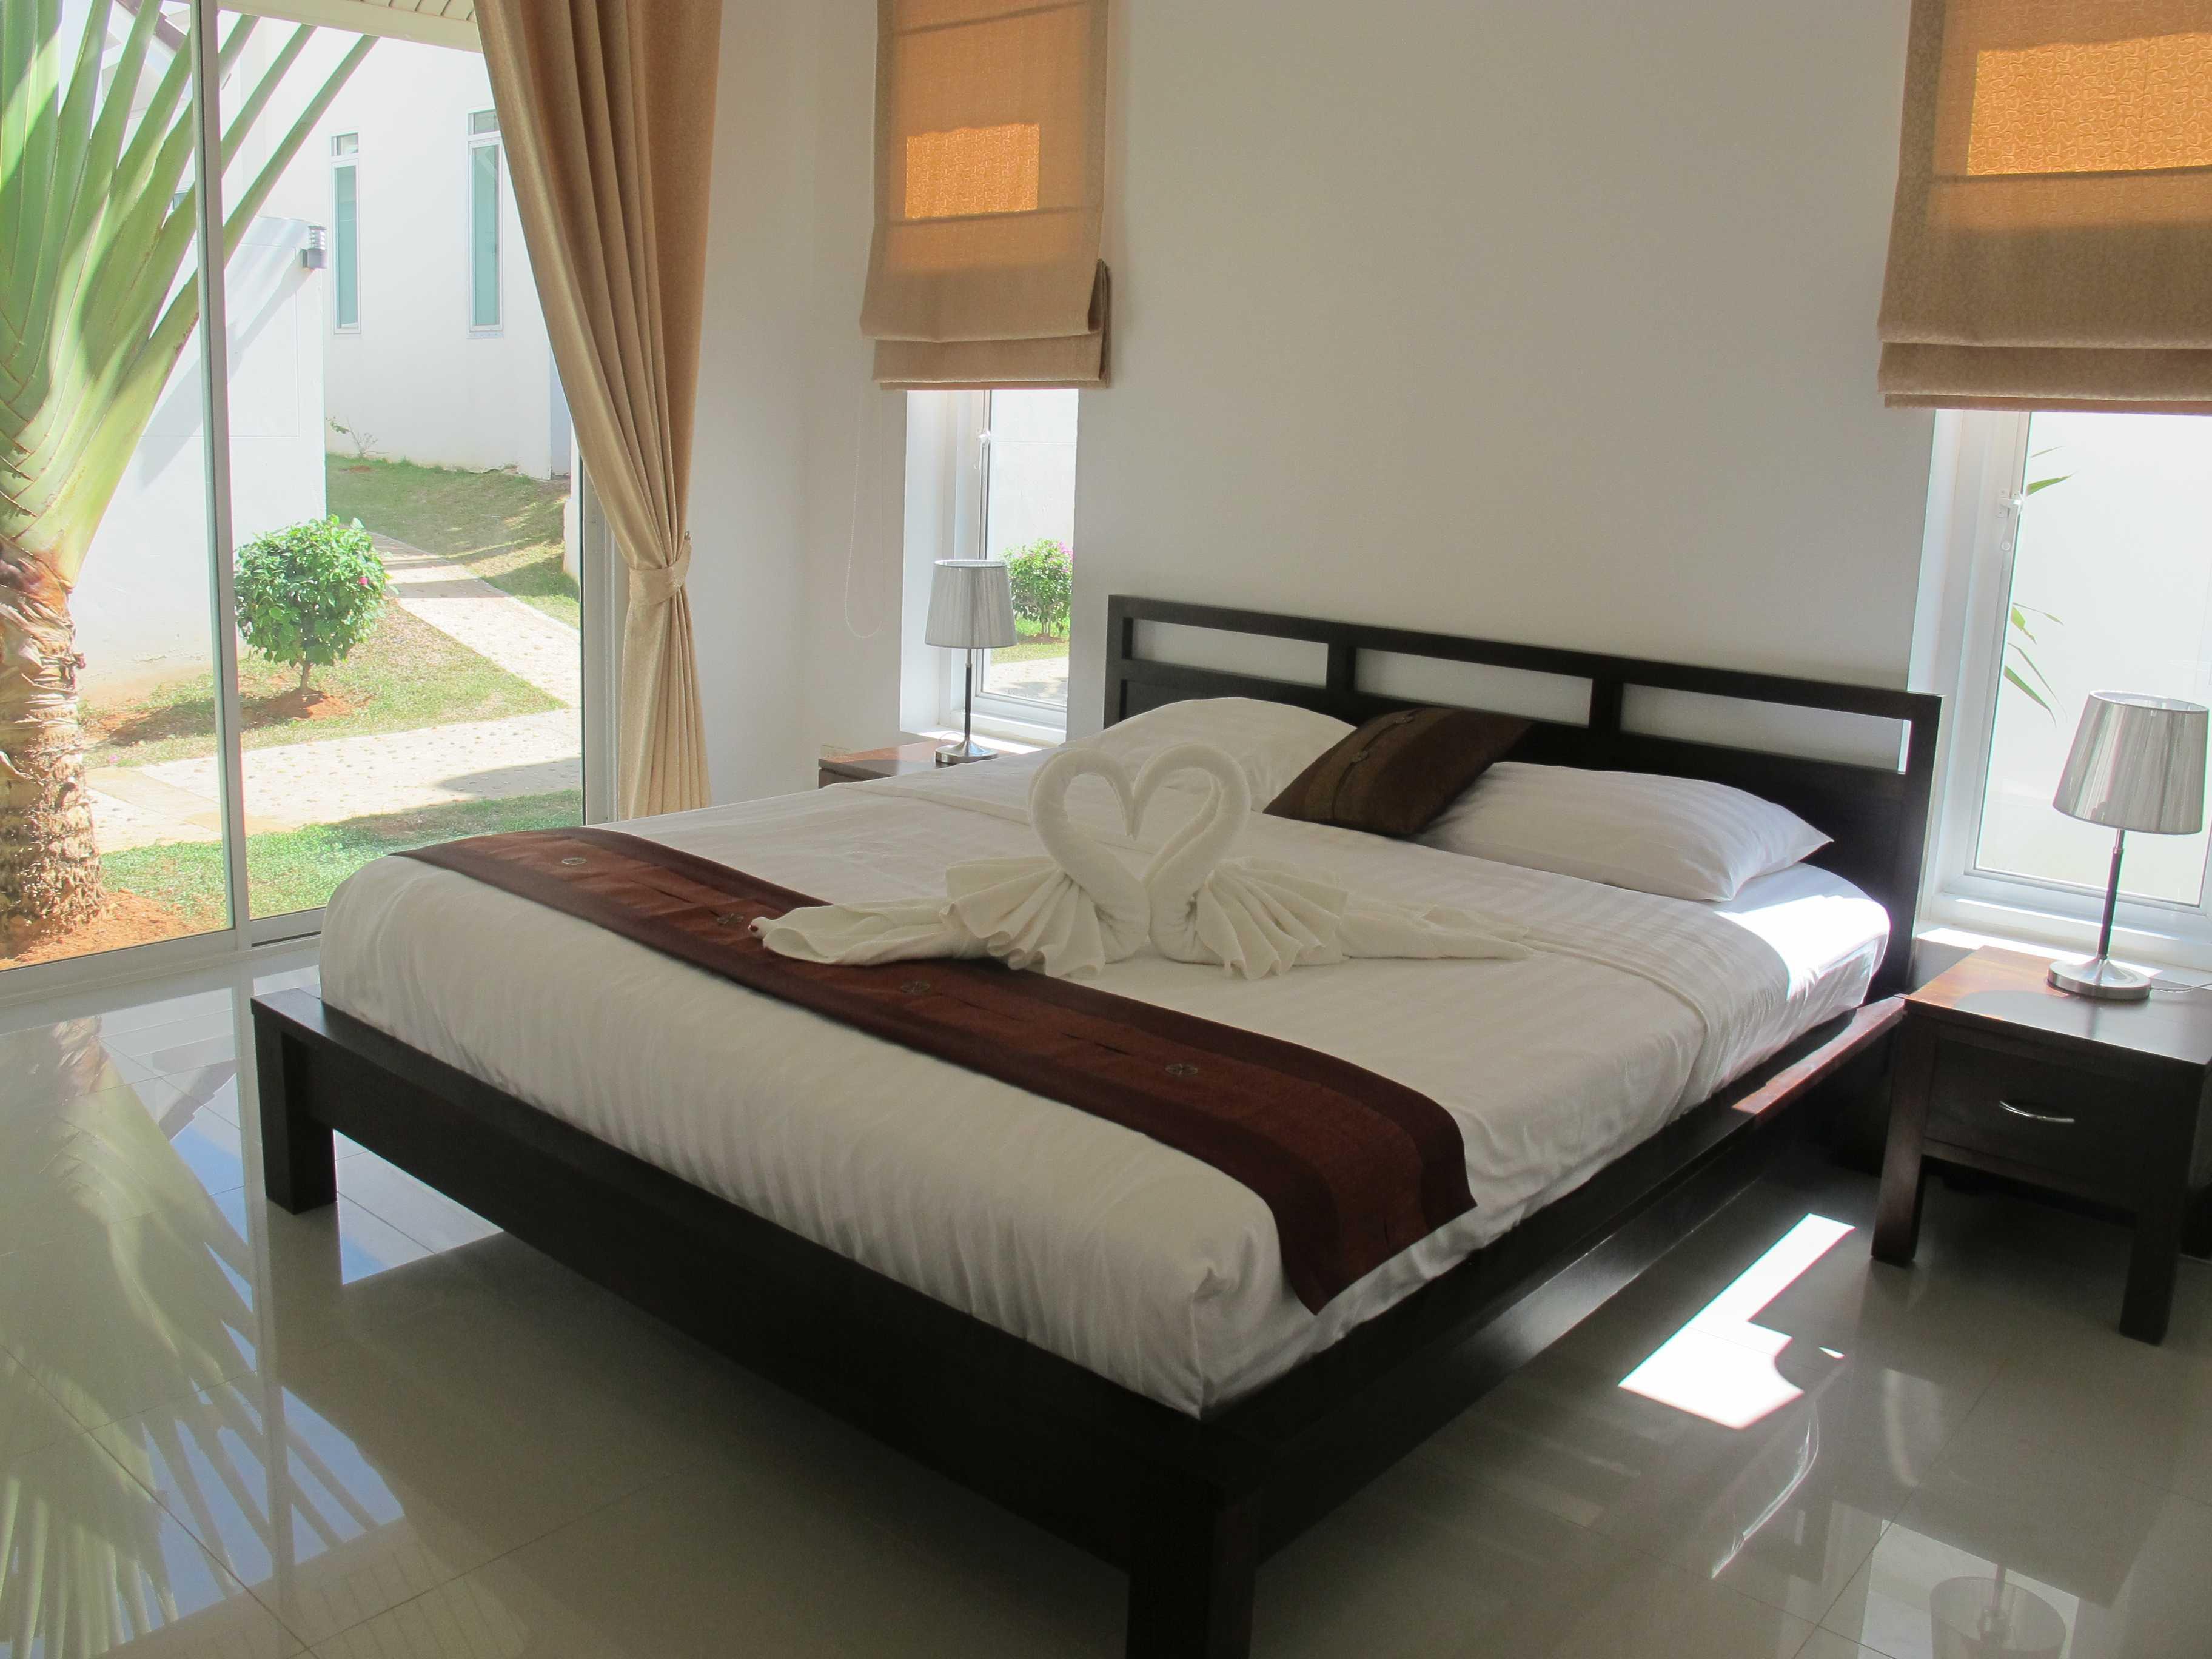 Soveværelse b8-9